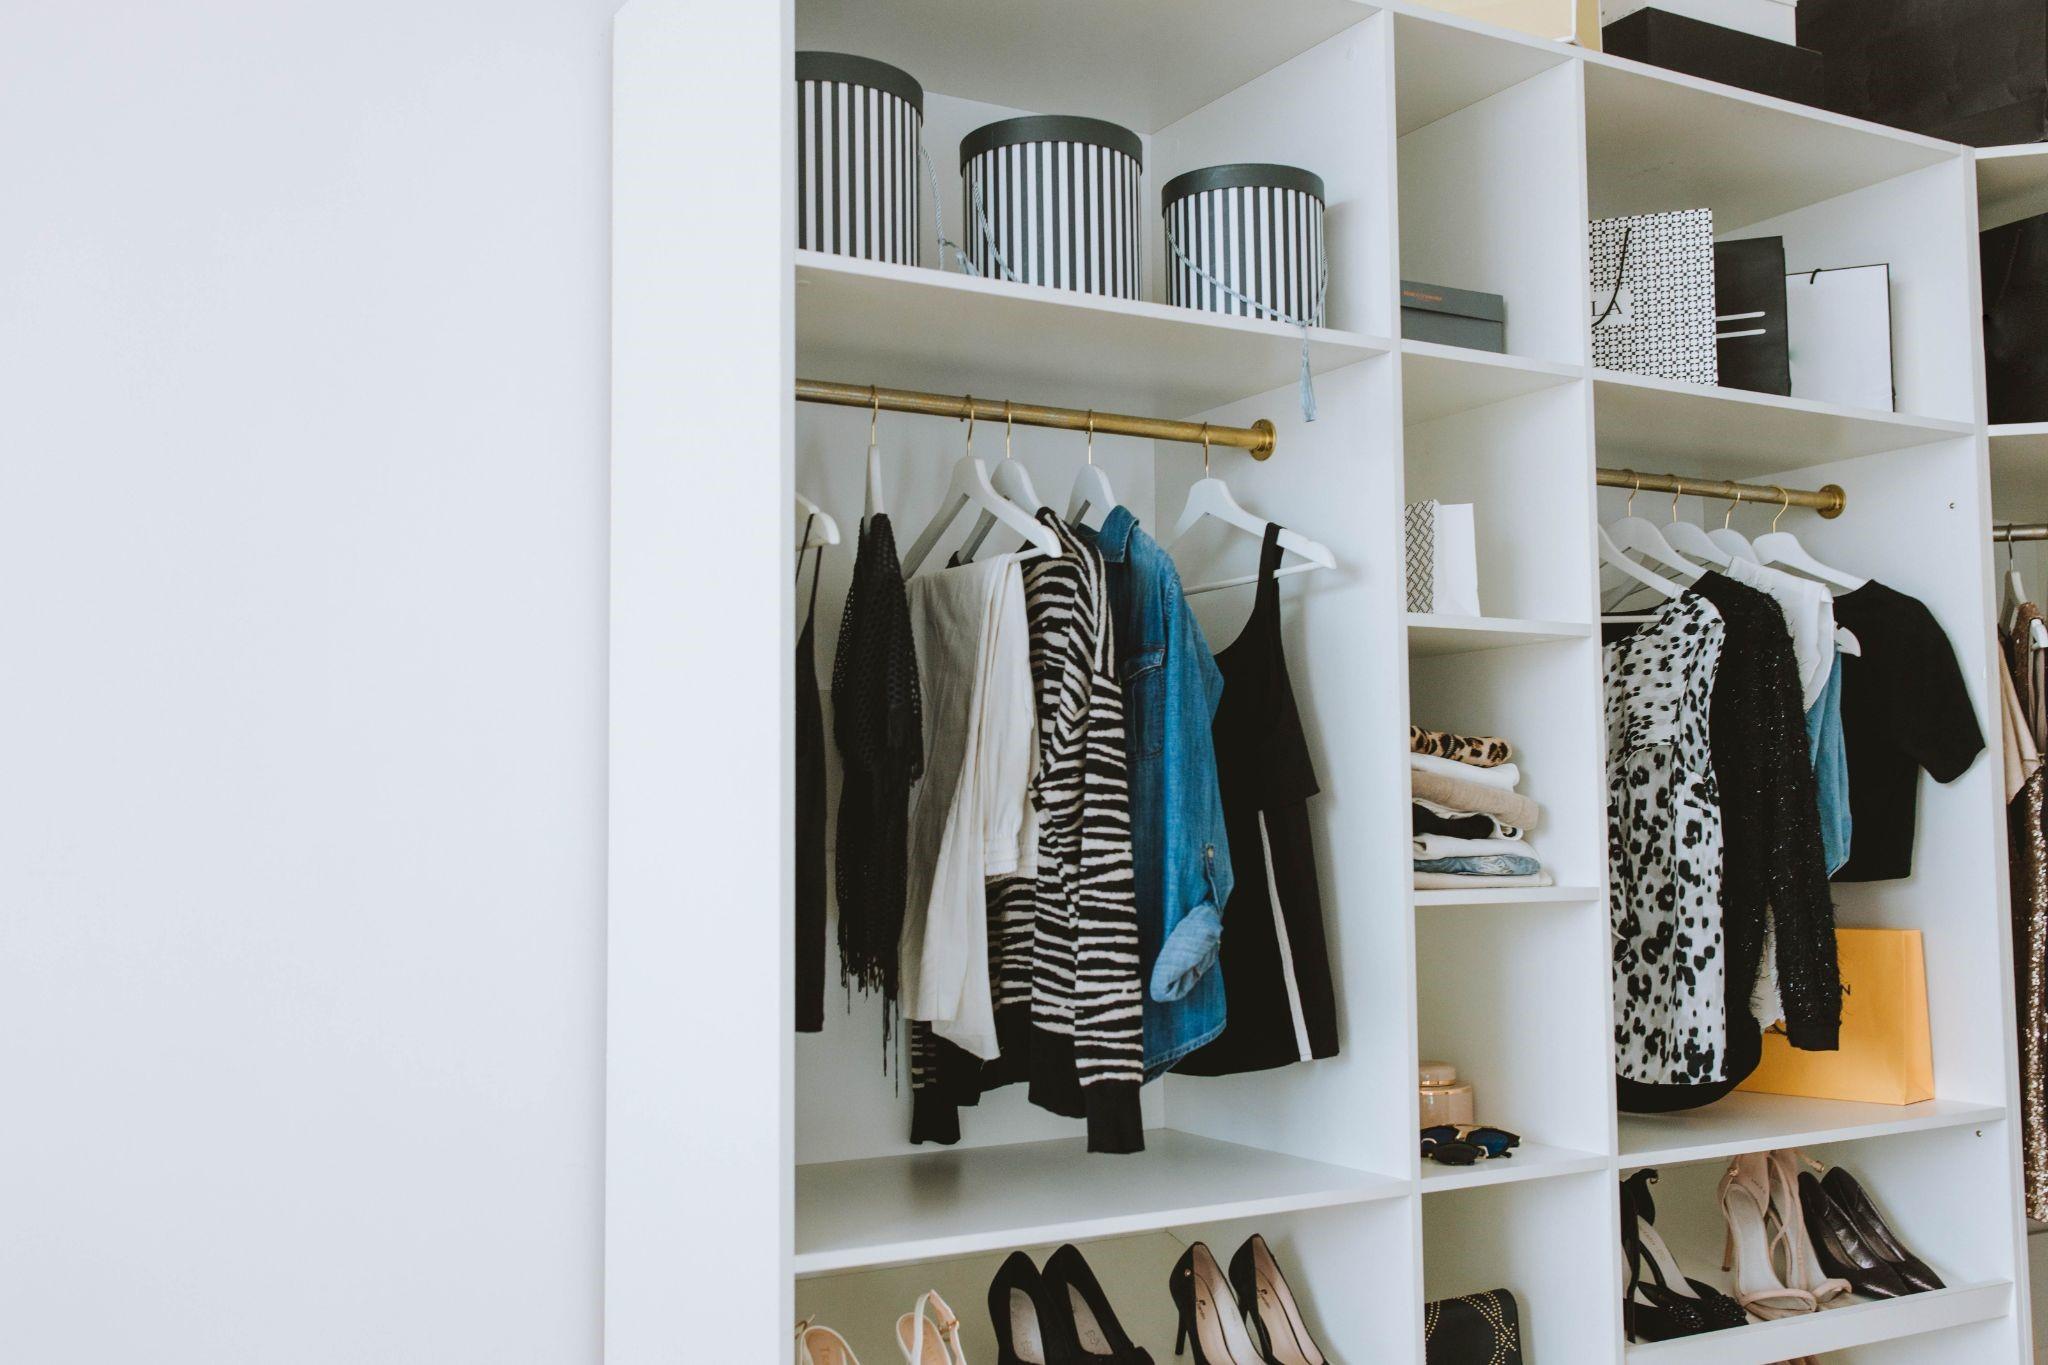 image - Reorganize Your Closet